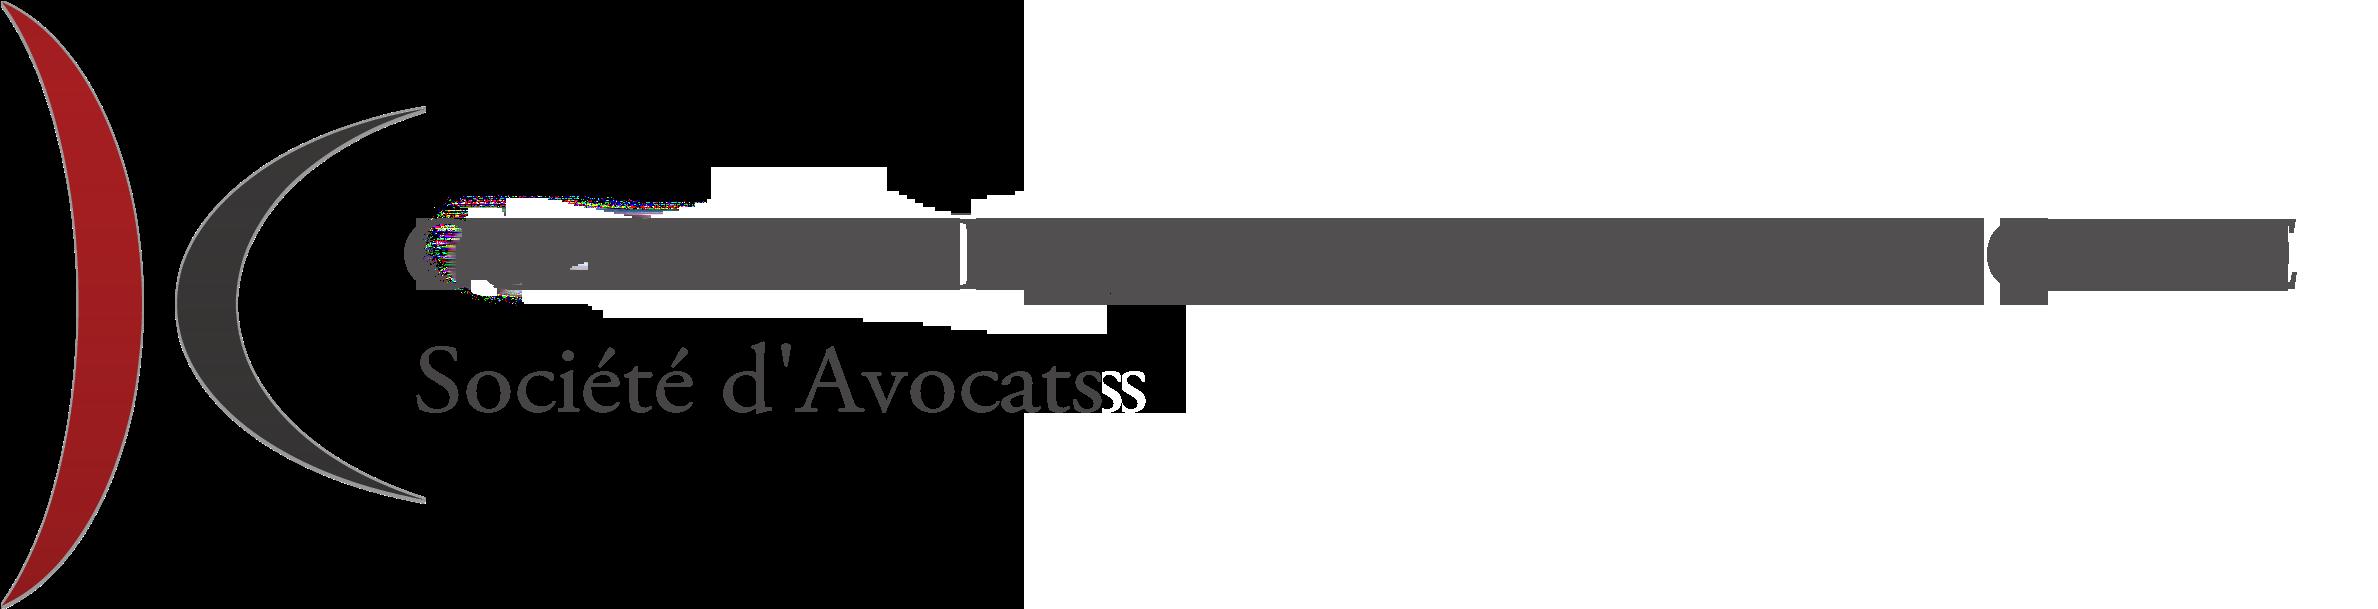 Cossalter, De Zolt & Couronne